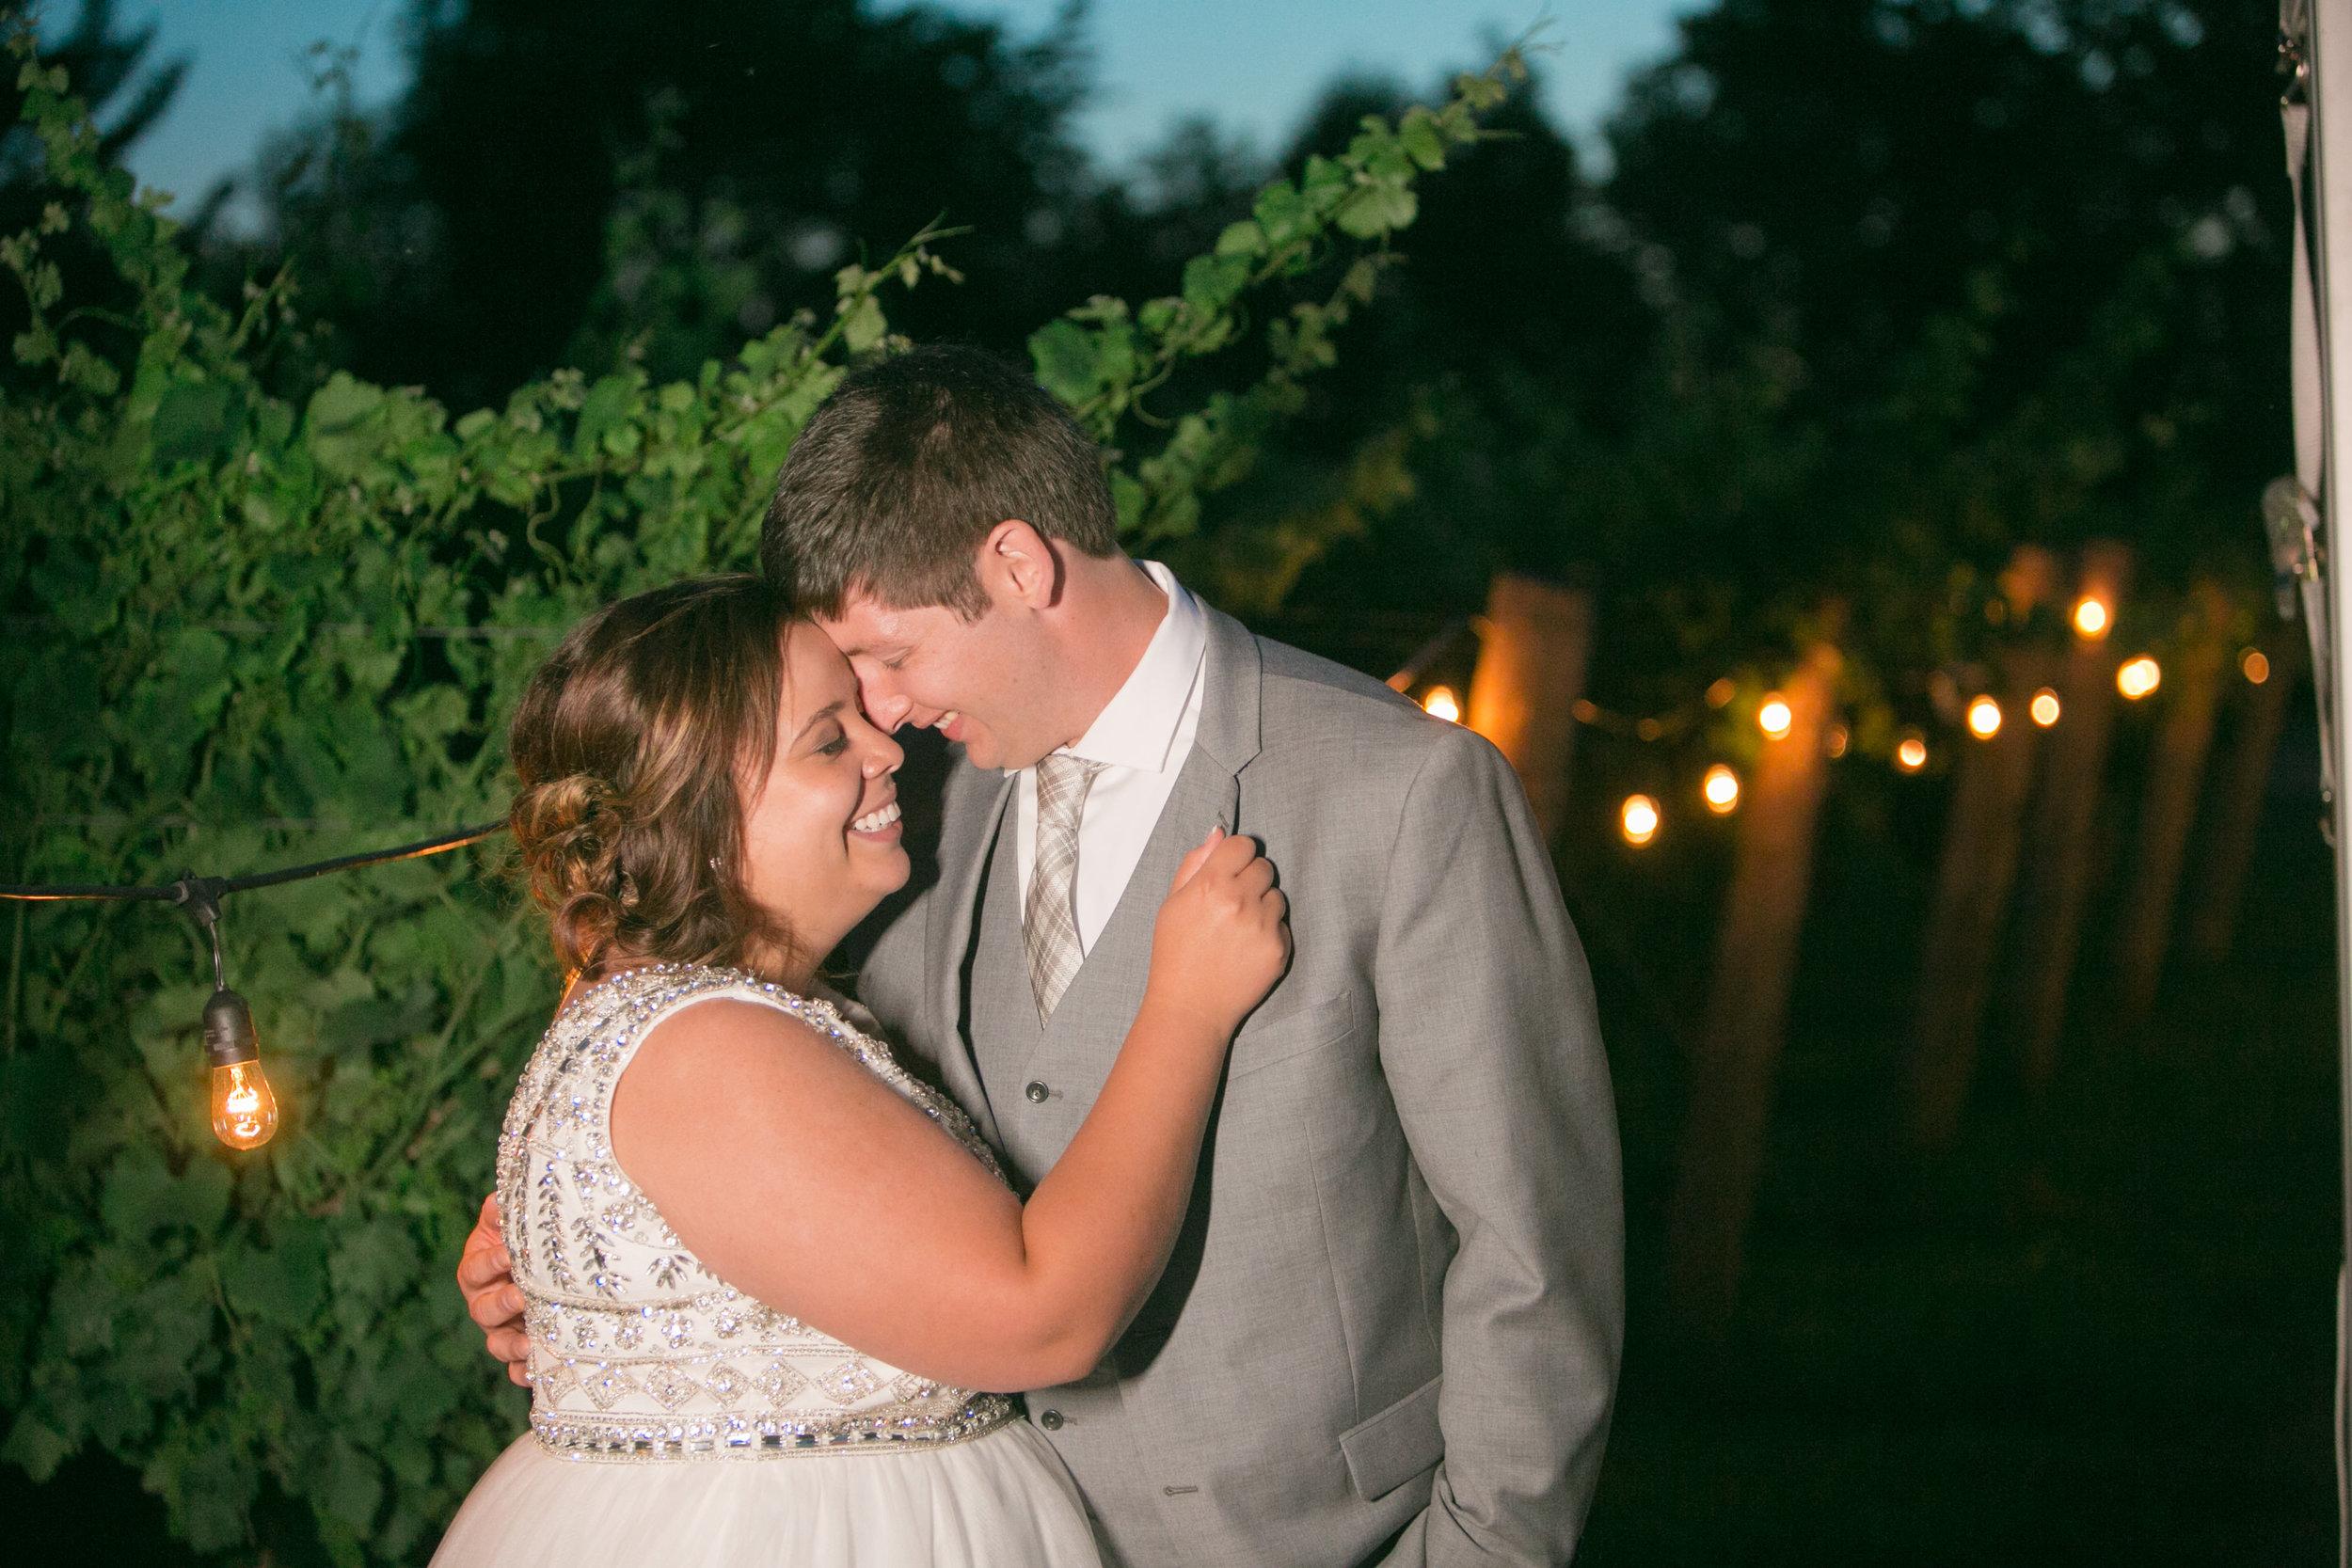 Kimberley + Cameron - Daniel Ricci Weddings - High Res. Finals-661.jpg